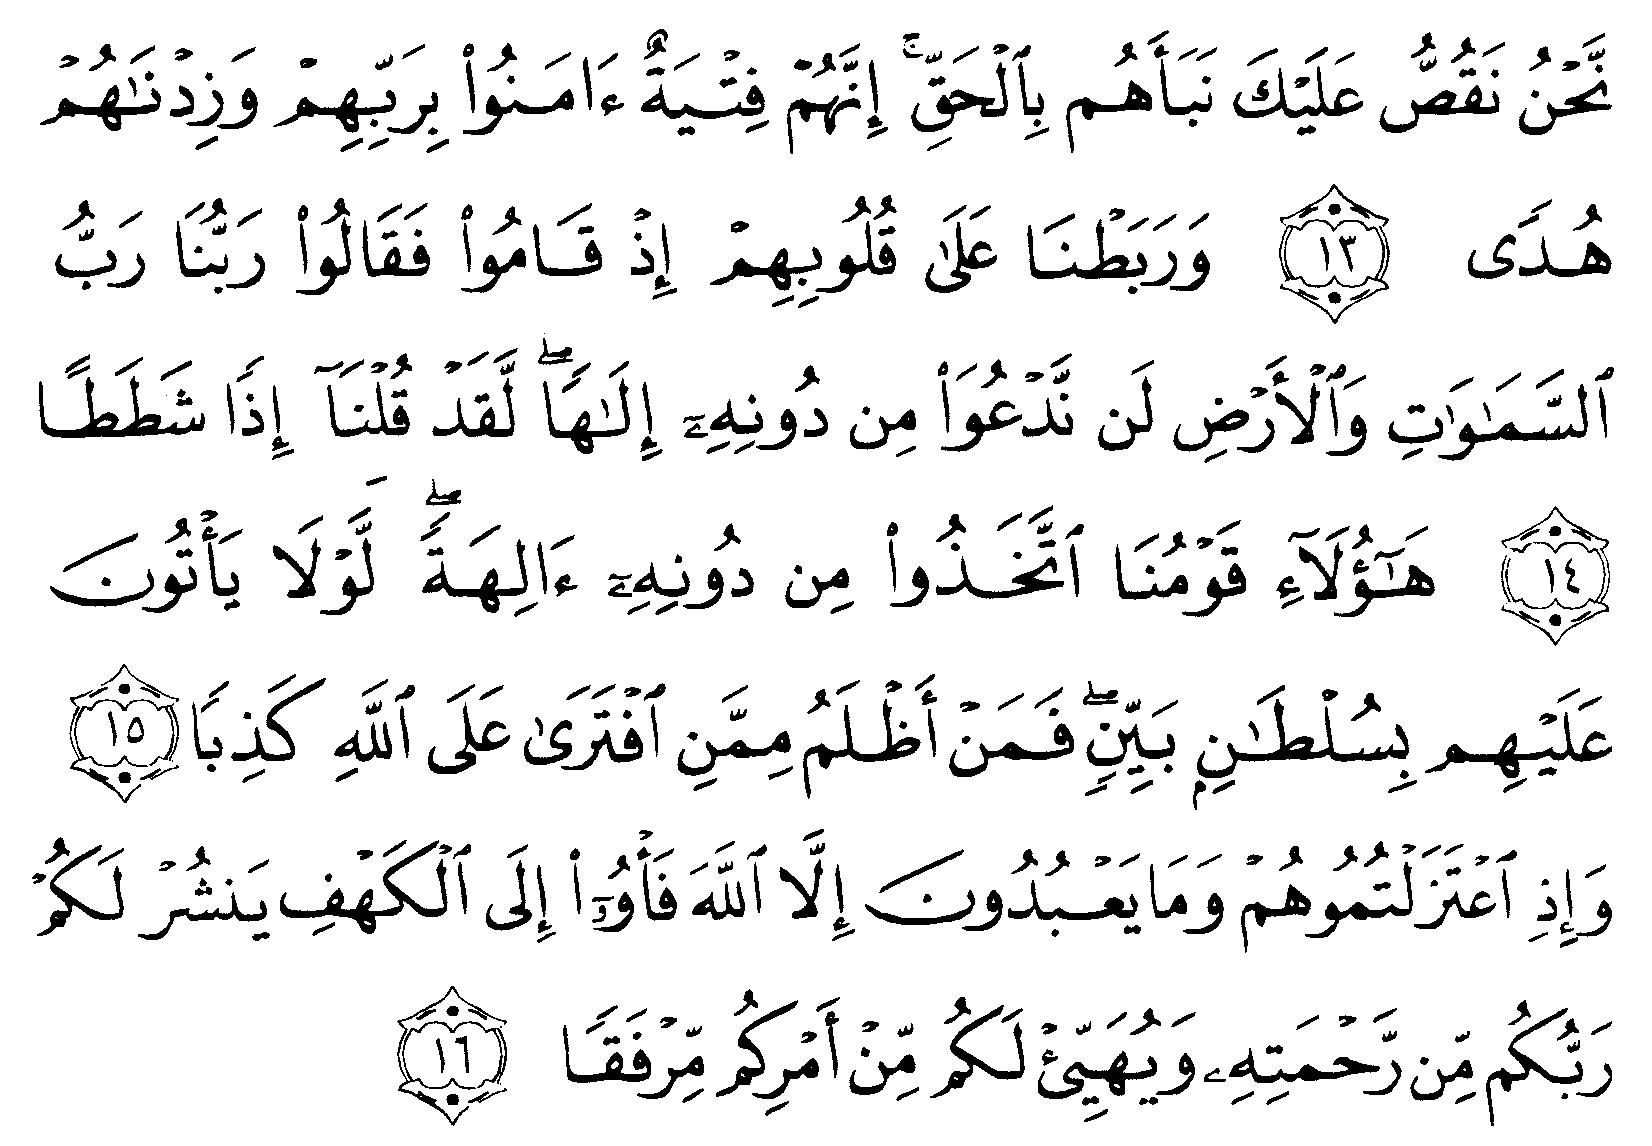 Tafsir Ibnu Katsir Surah Al Kahfi Ayat 13 16 Alquranmulia